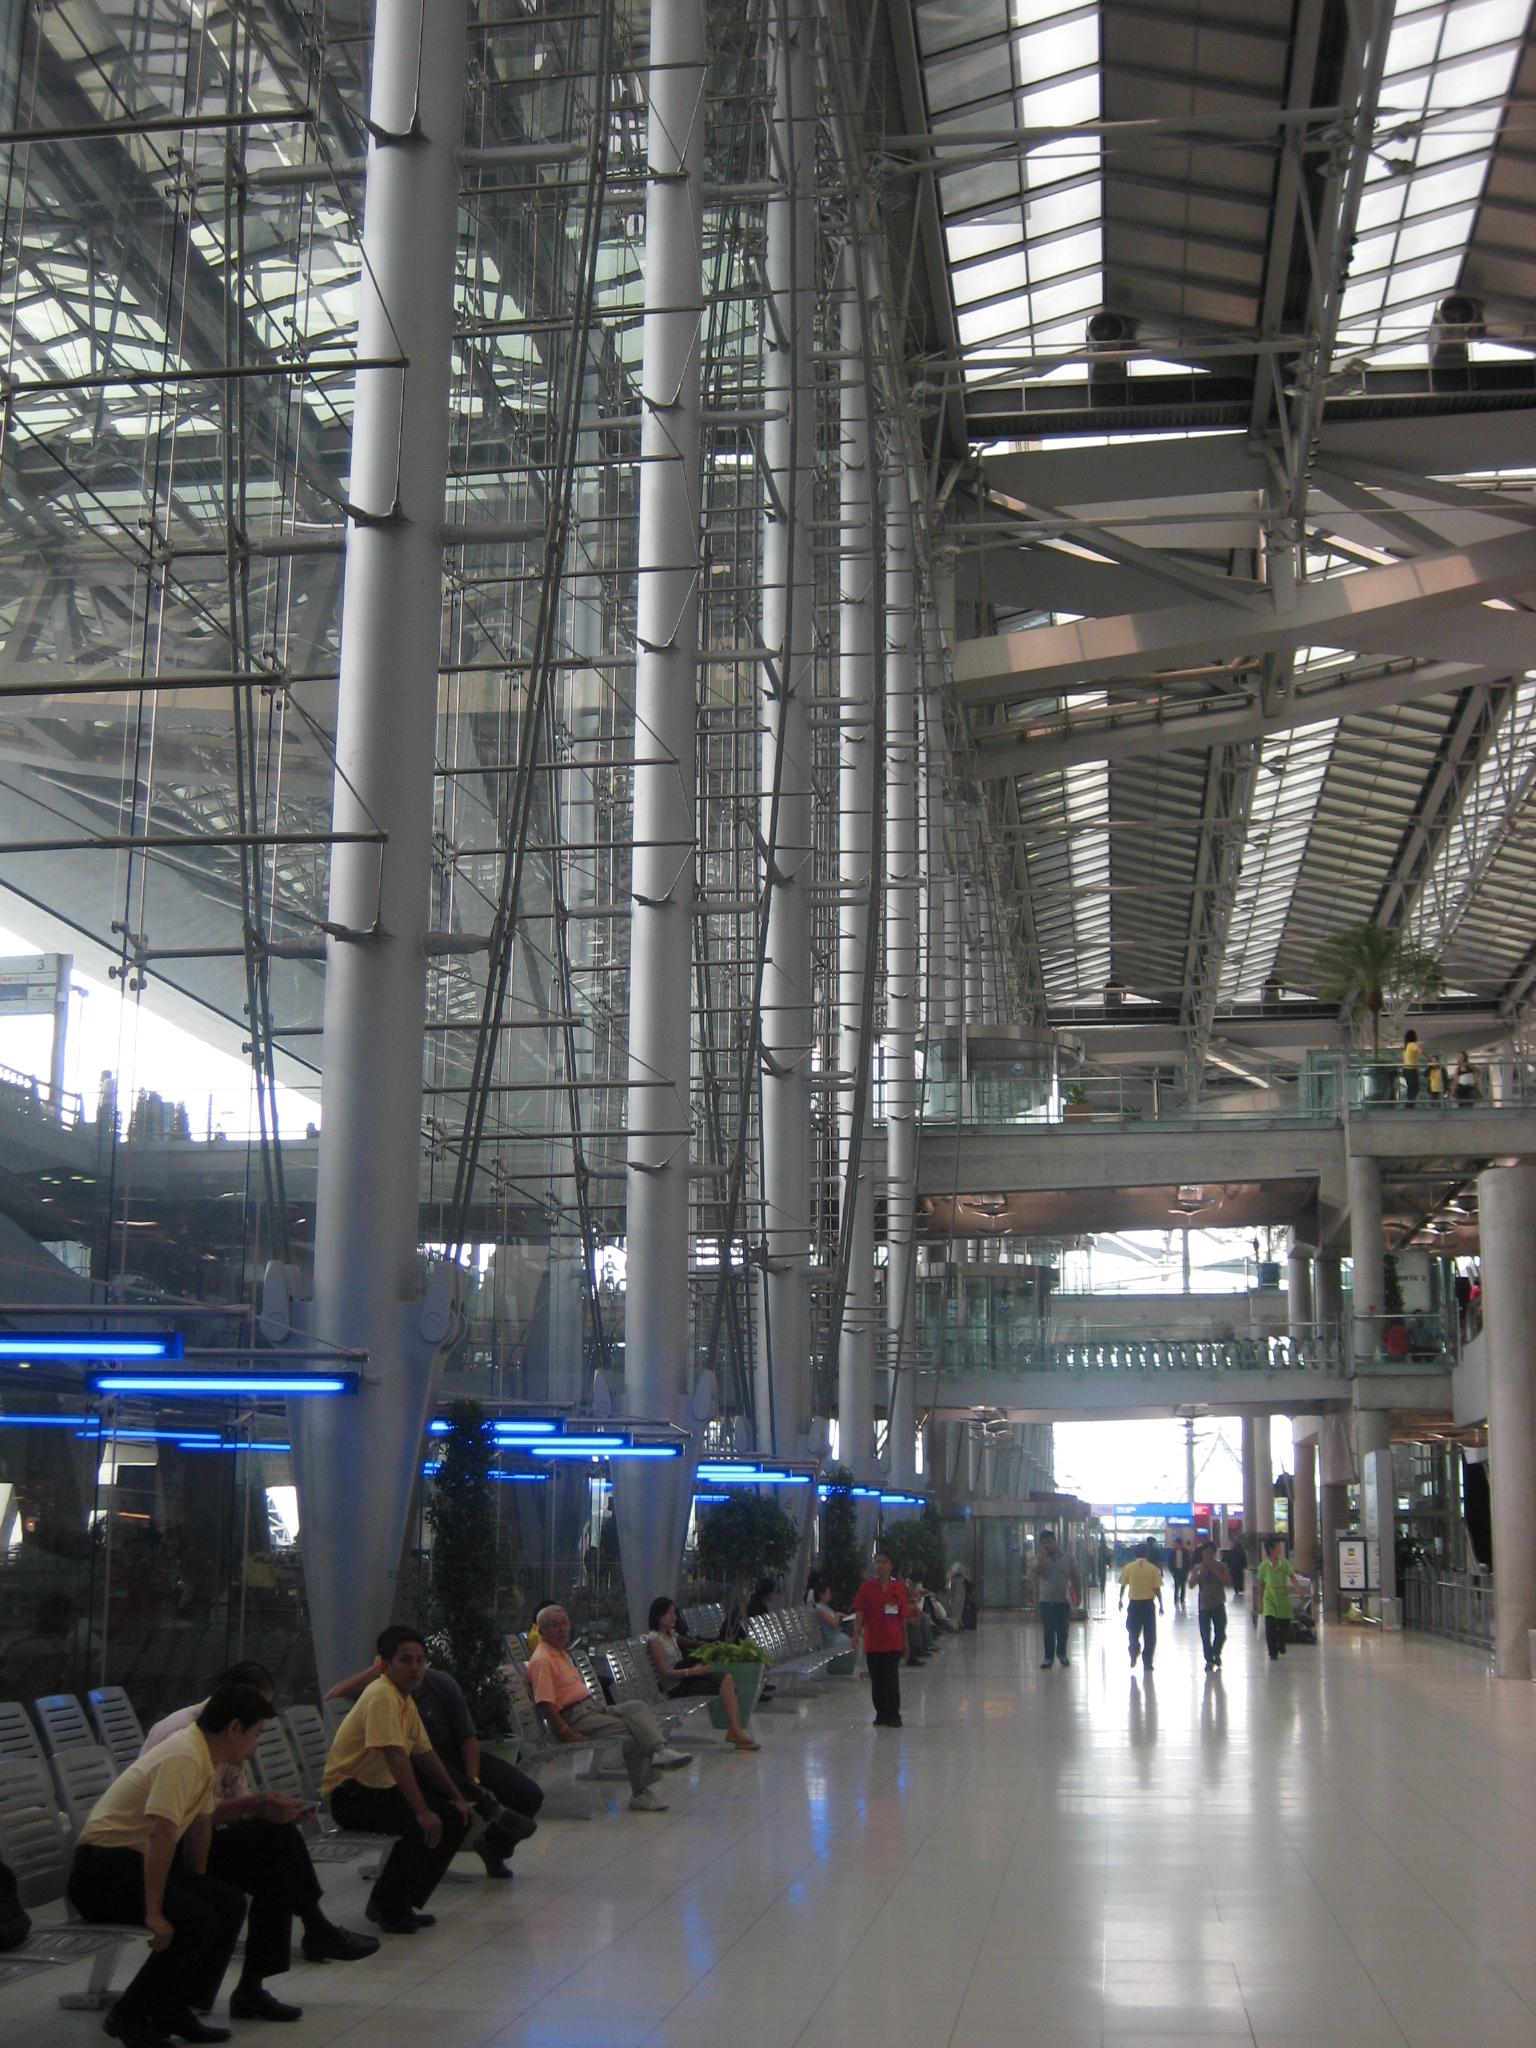 FileSuvarnabhumi Airport Arrival HallJPG  Wikimedia